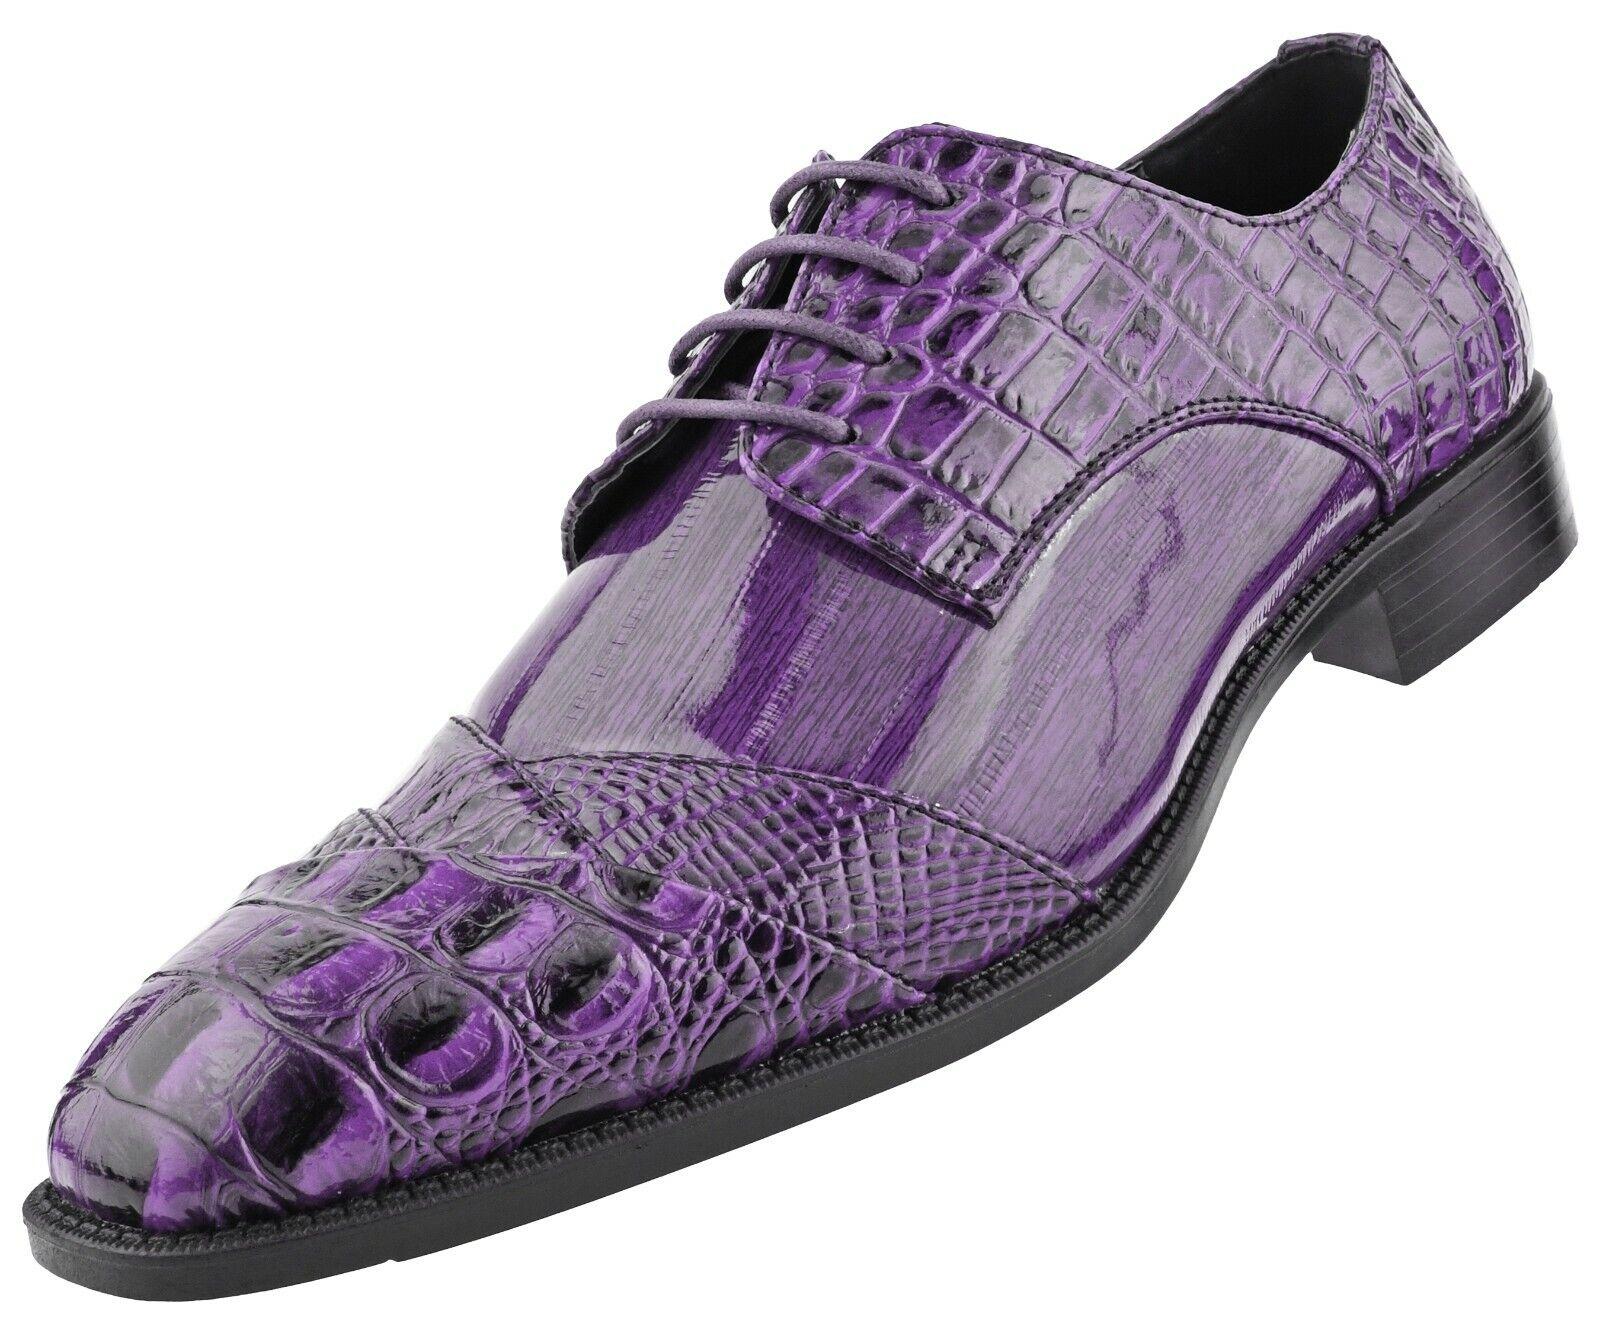 Santimon Mens Western Boots Leather,Lace Up Dress Oxford Shoes,Designer Boots for Men